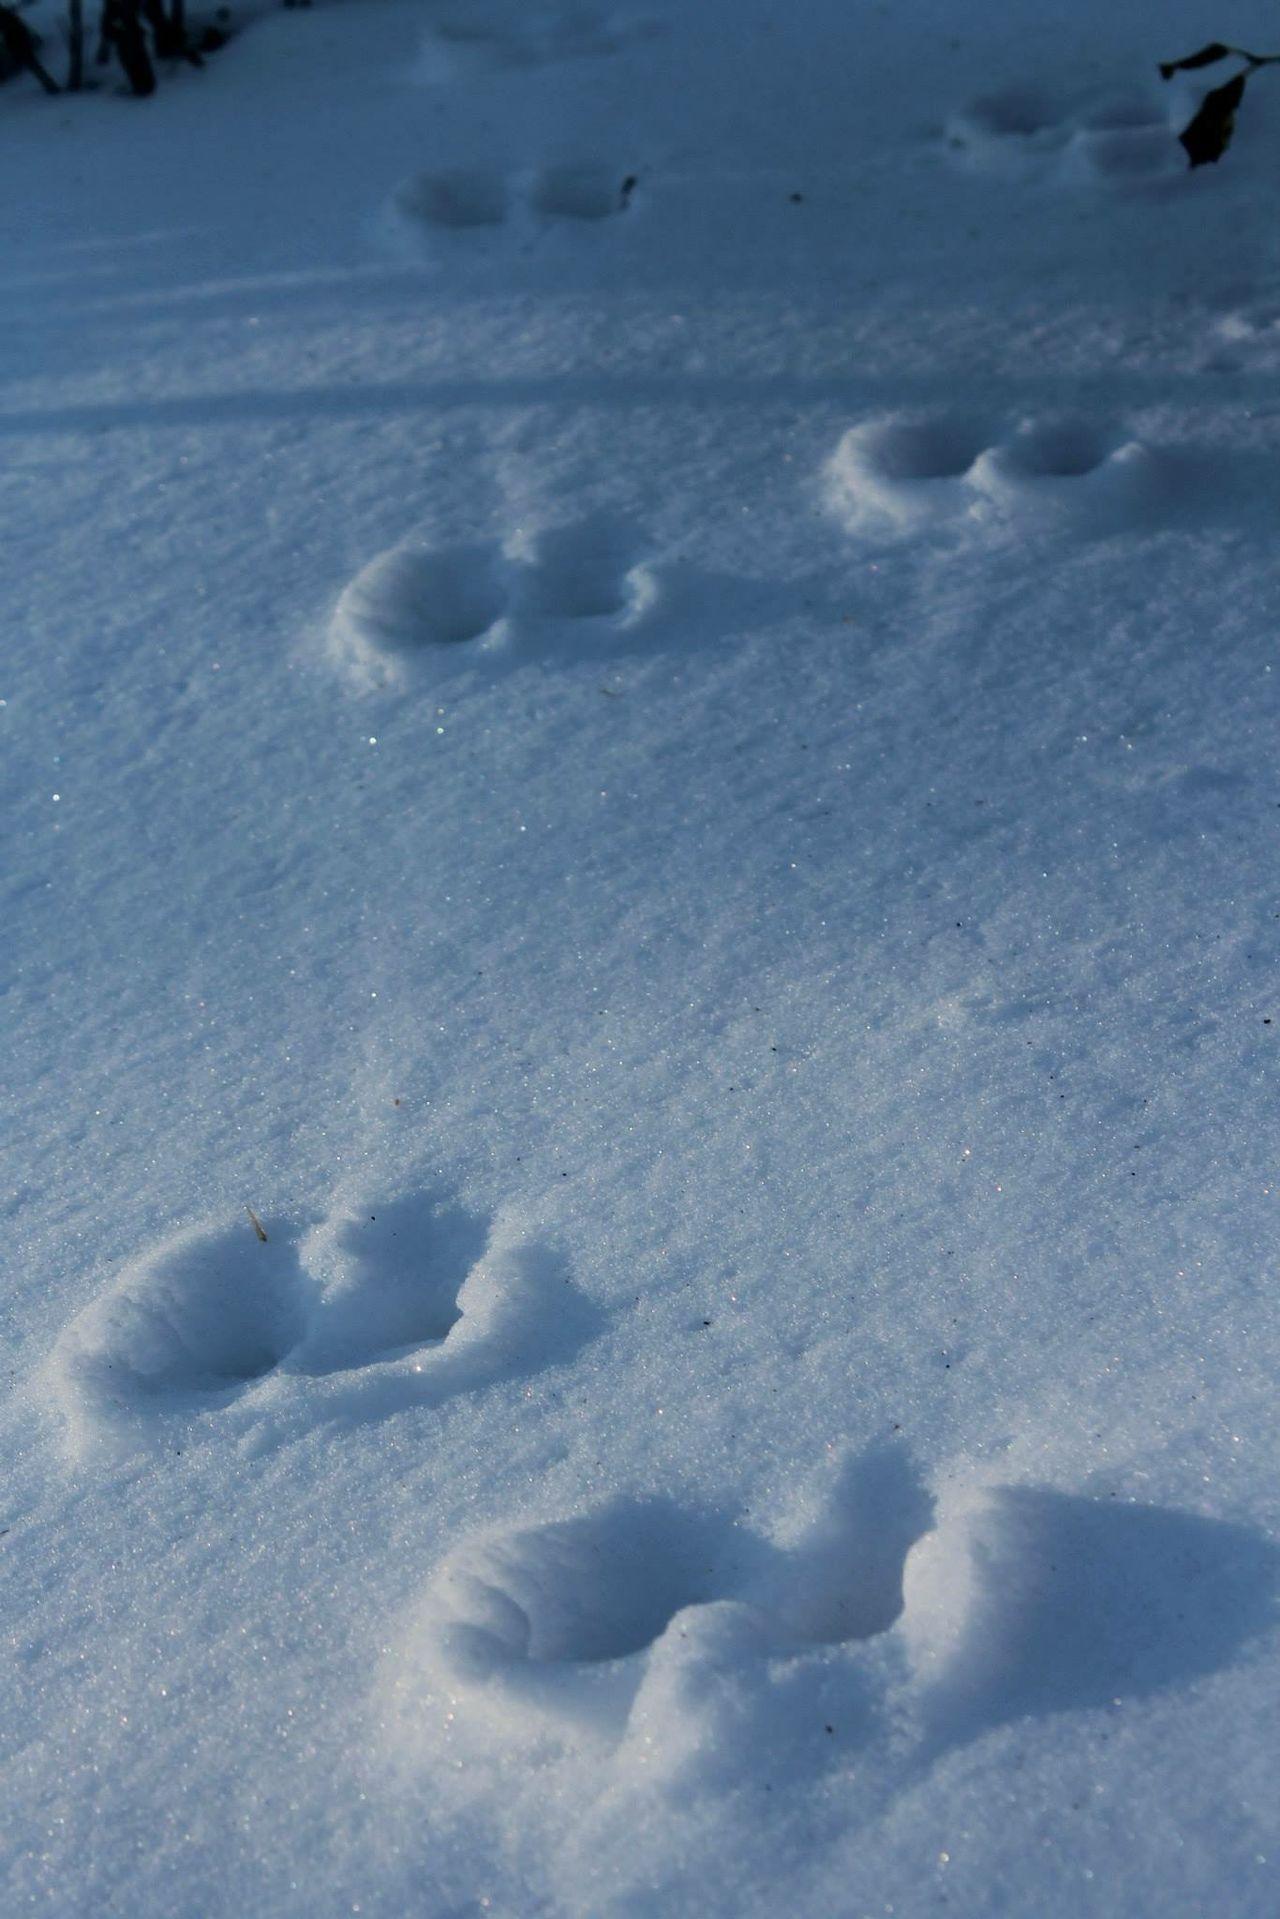 Snow Snow ❄ Snowing Animal Tracks Rabbit Tracks Footprints Footprints In The Snow